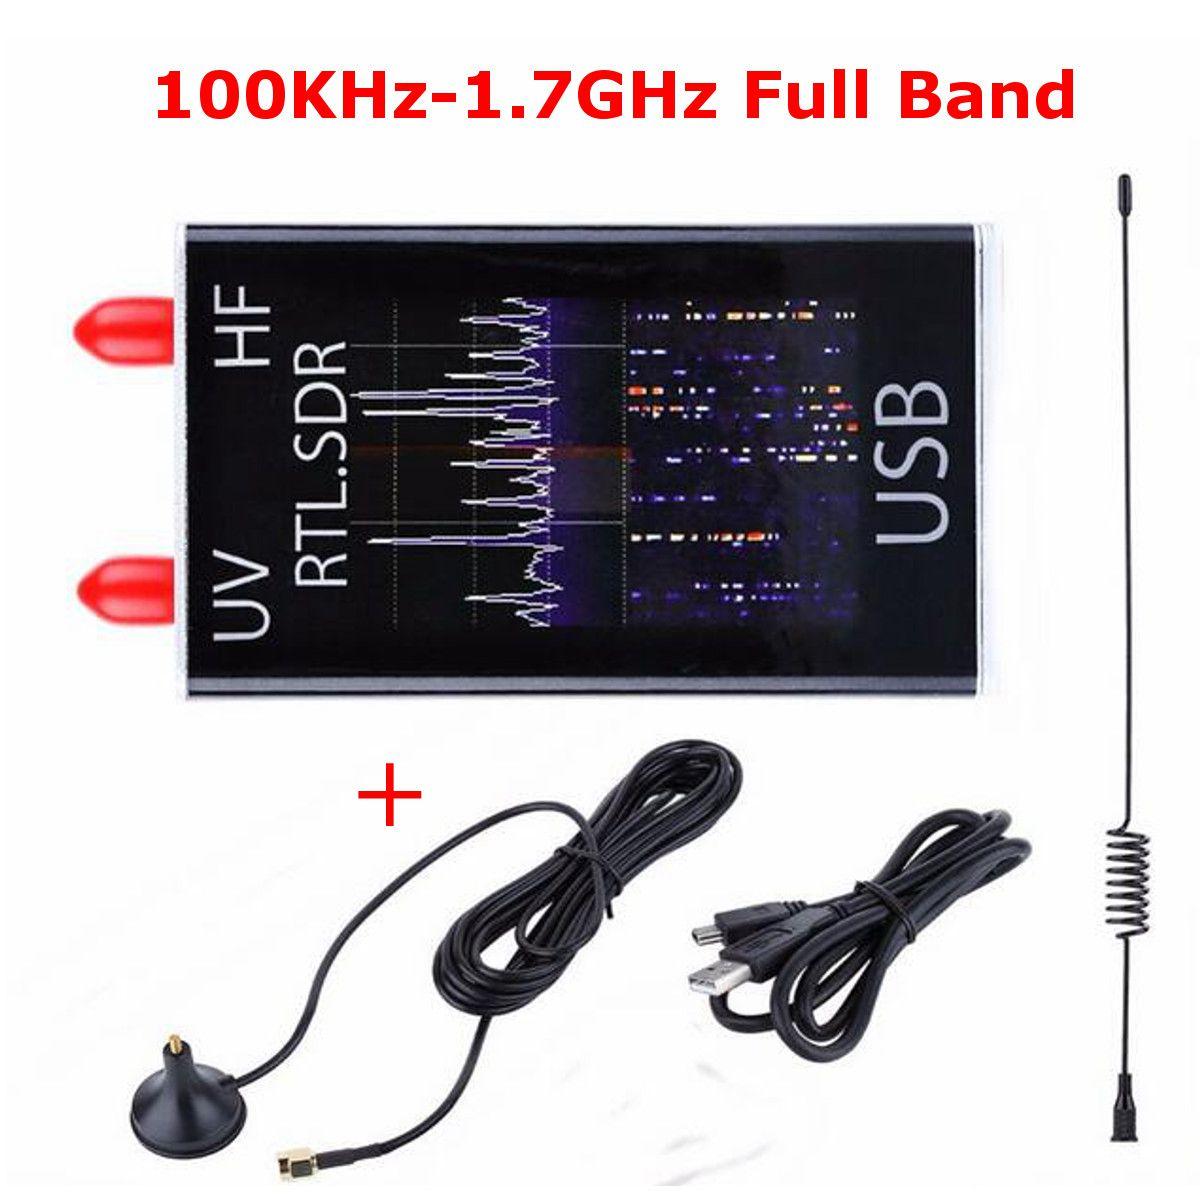 Mini Full Band UV HF RTL-SDR USB Digital Mobile TV Tuner Receiver 100KHz-1.7GHz / R820T+8232 Ham Radio with Antenna for Phone PC new version 100khz 1 7ghz uv hf full band software radio rtl sdr receiver rtl2832 r820t2 usb tuner